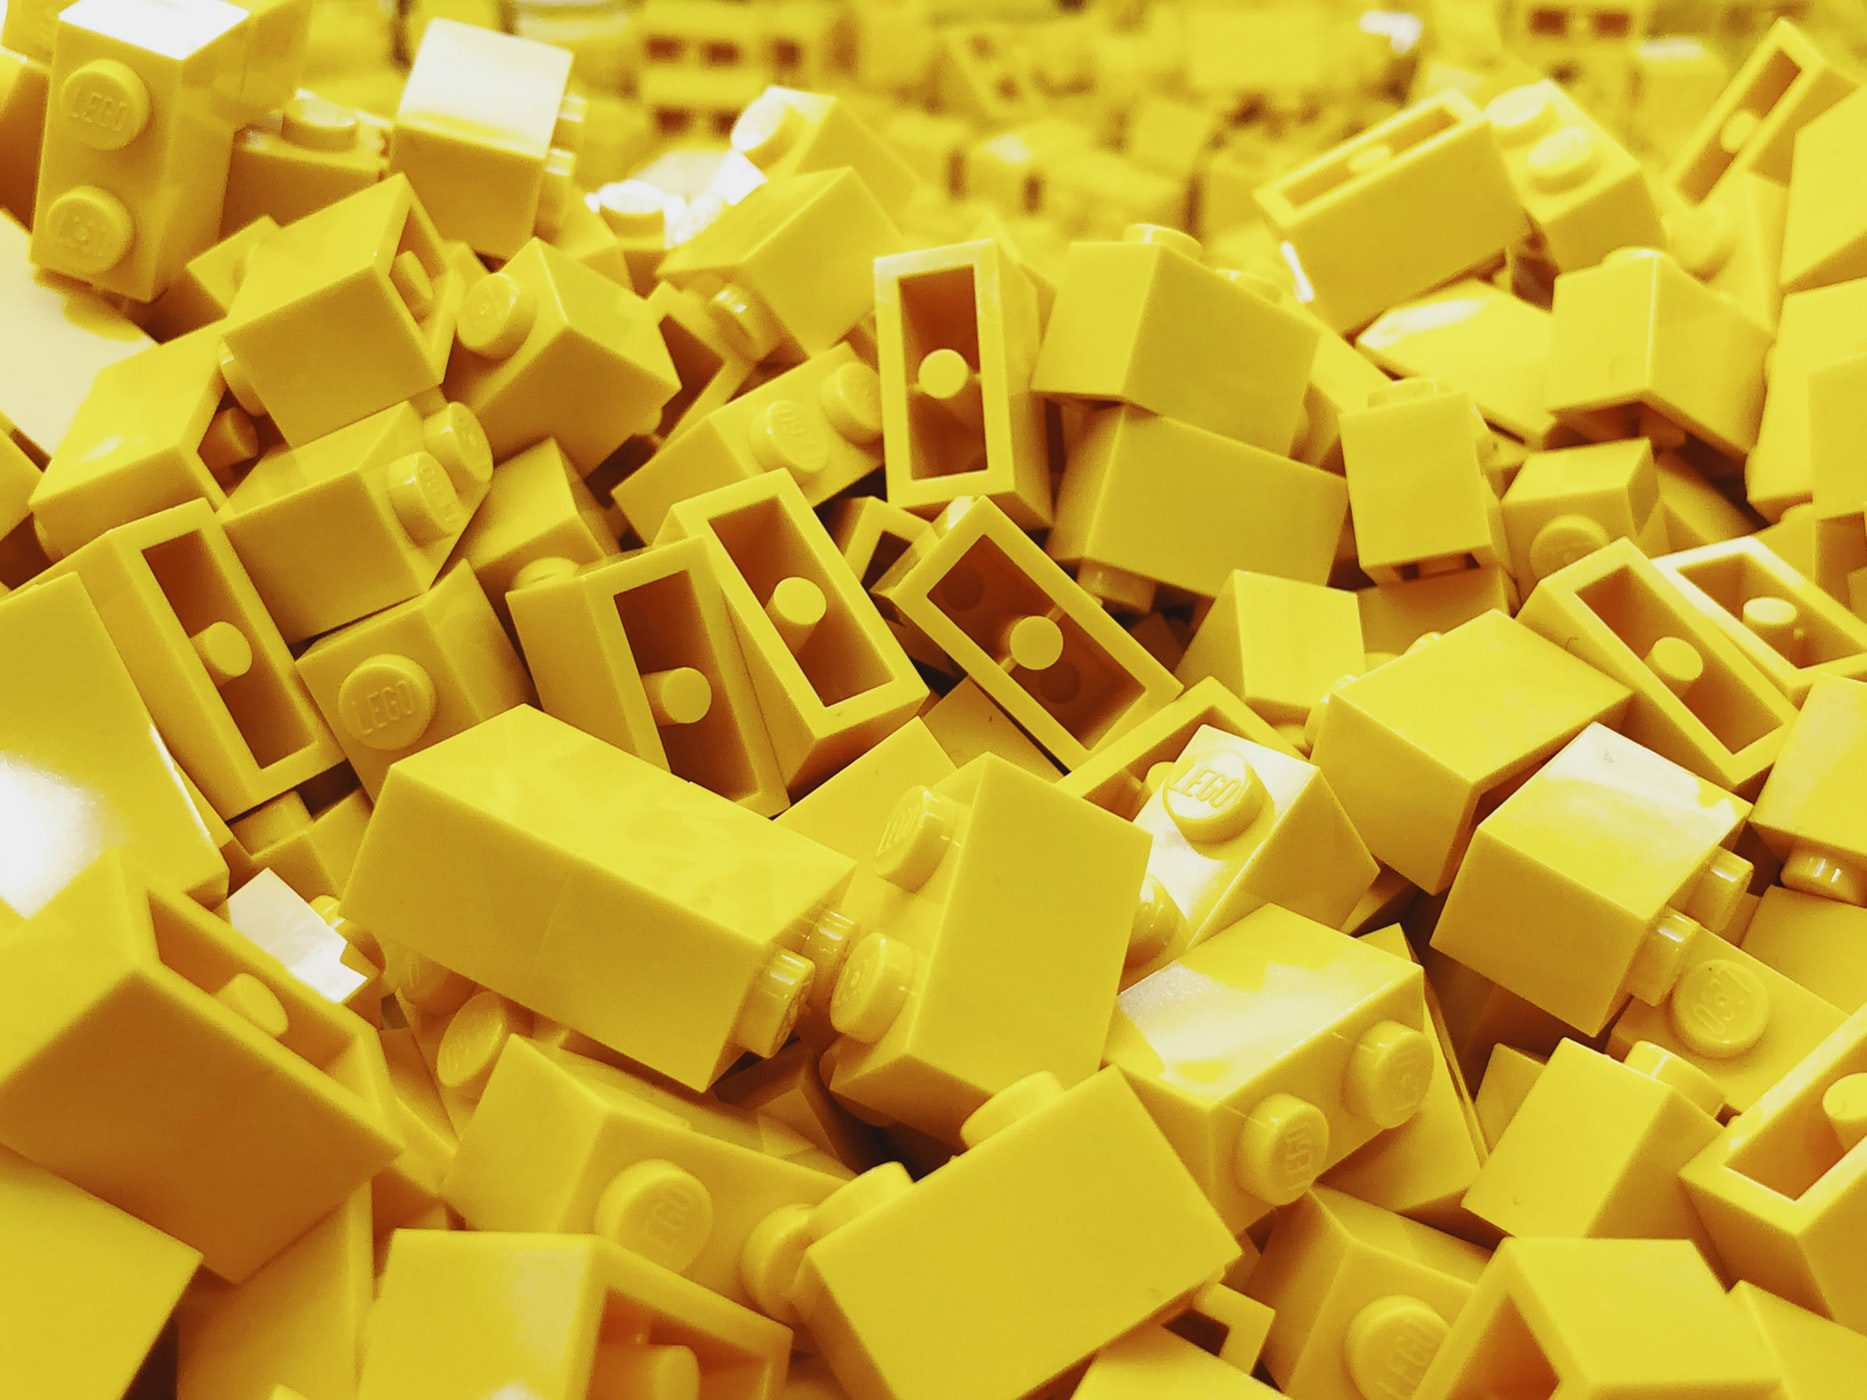 ABS Material_Lego Bricks